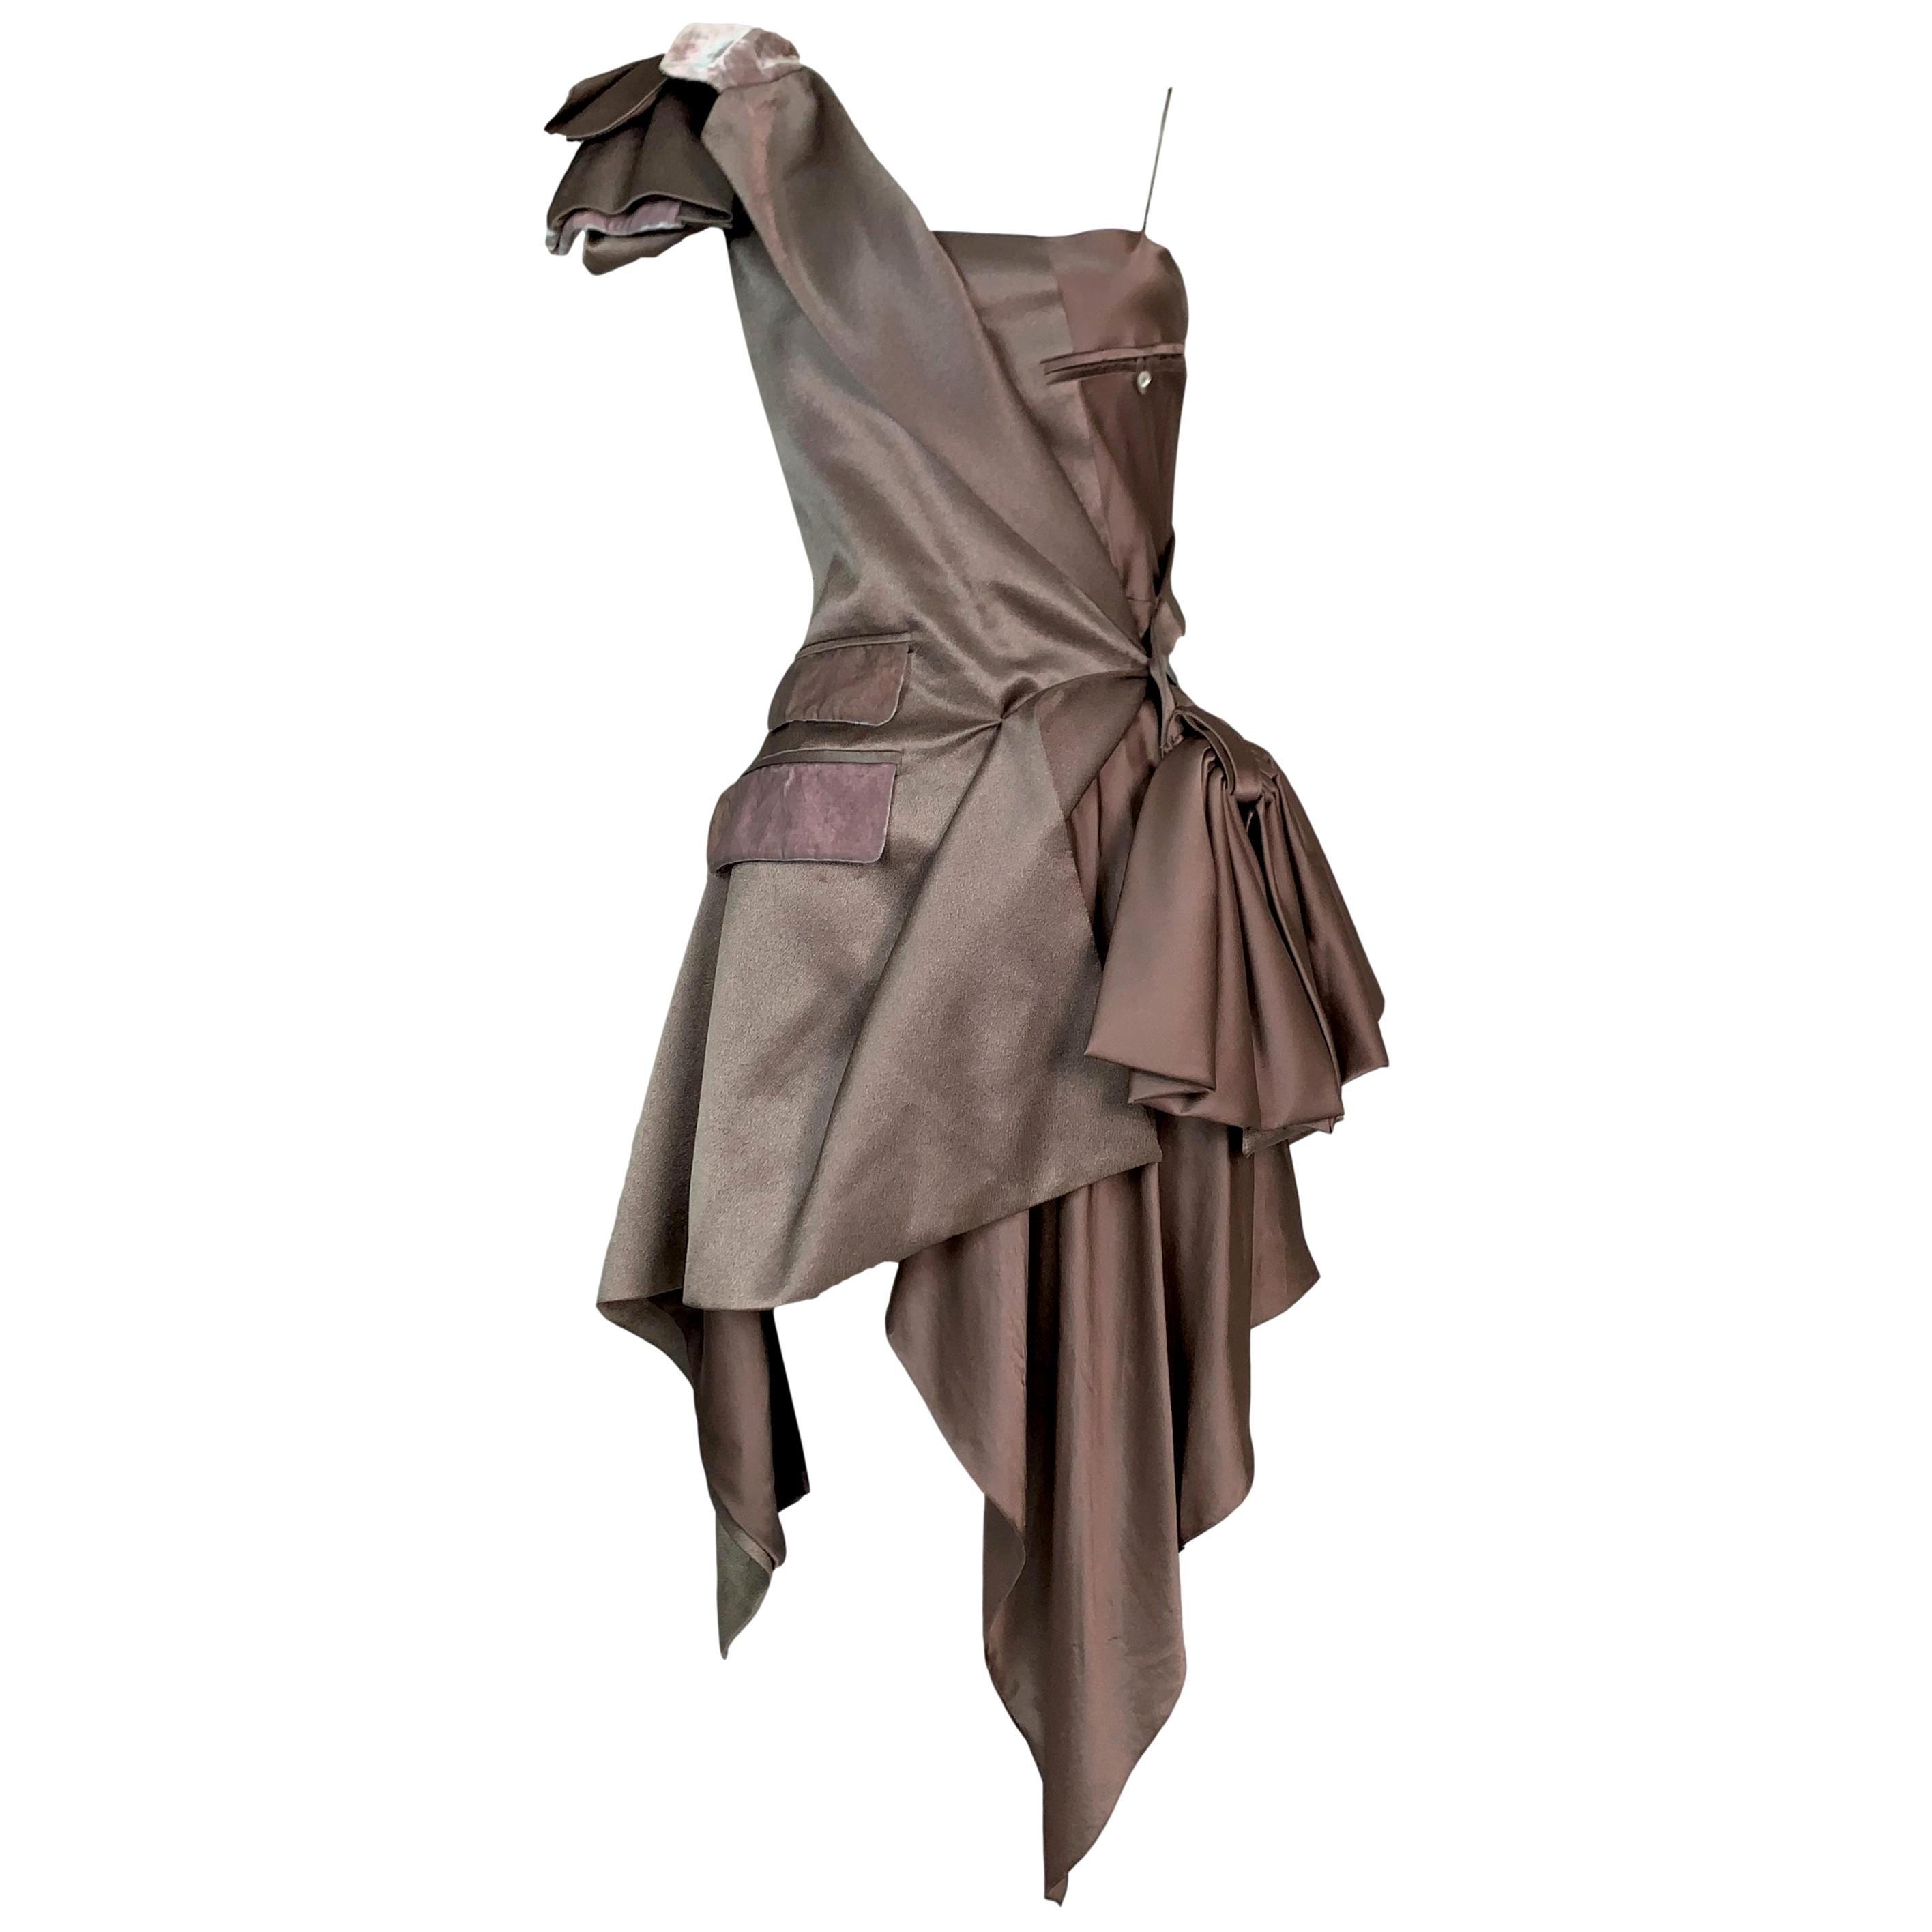 S/S 2000 John Galliano Runway Avant Garde Bow Mini Dress